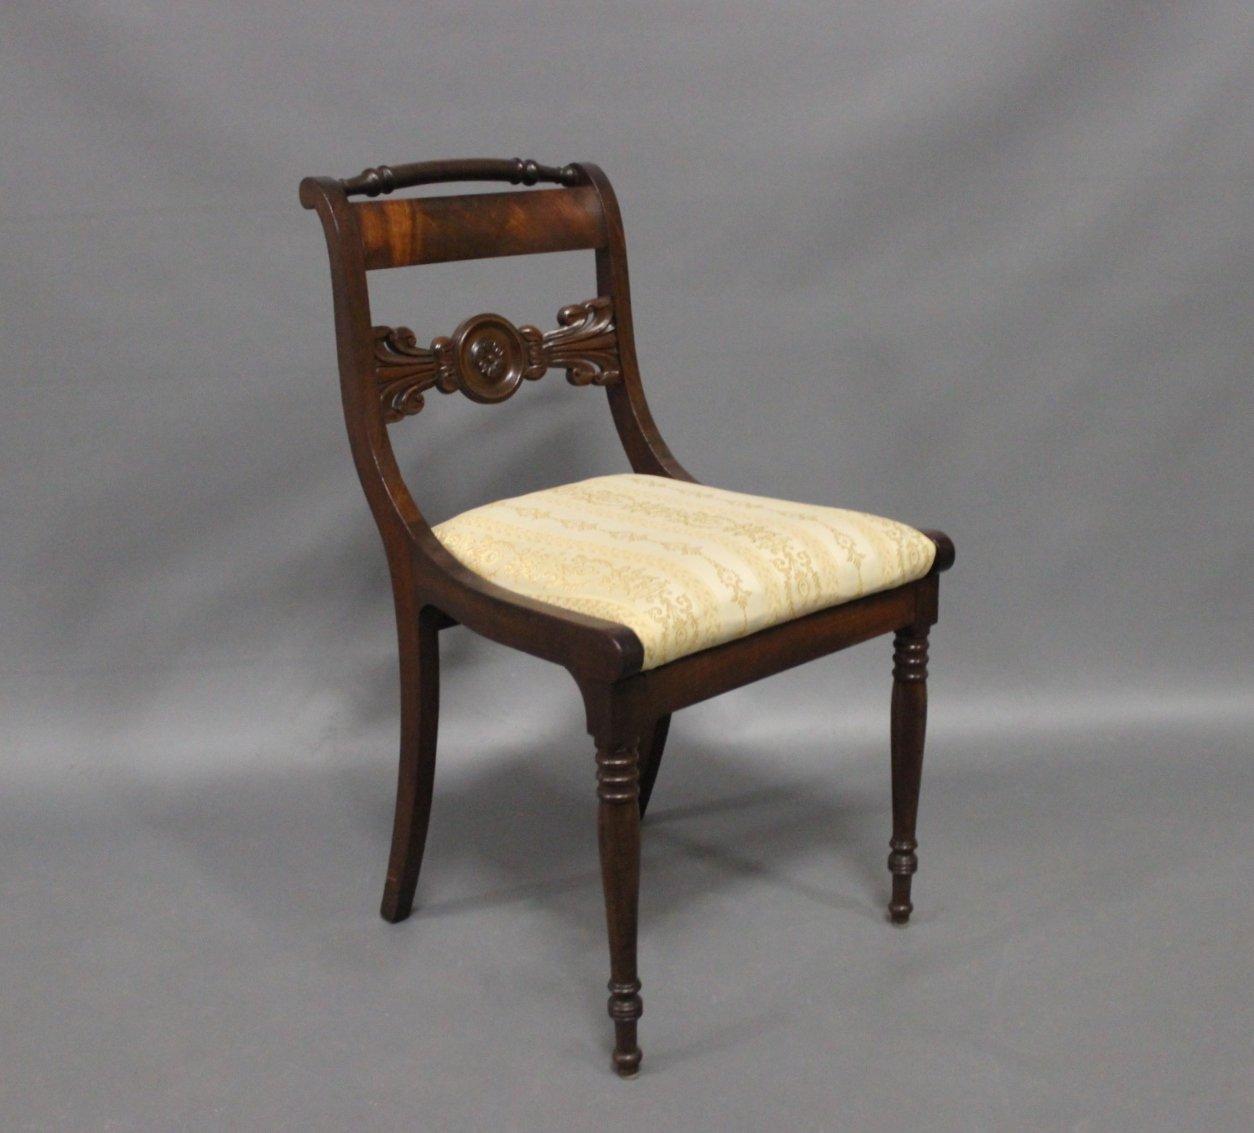 Antique Danish Chairs  19th Century  Set of 9. Antique Danish Chairs  19th Century  Set of 9 for sale at Pamono